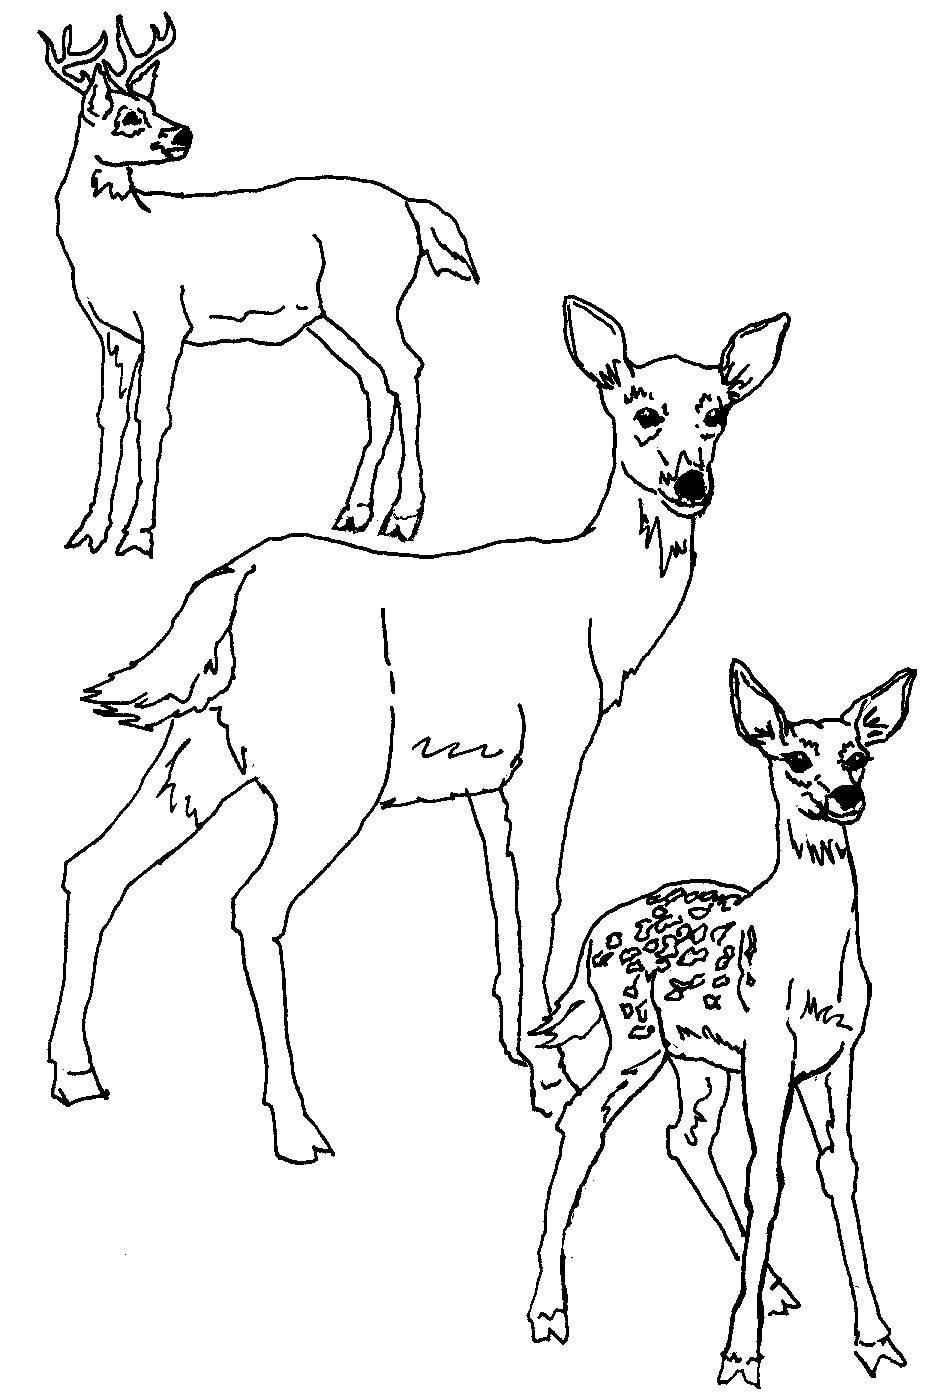 Deer Coloring Pages Free Printable Deer Coloring Pages For Kids